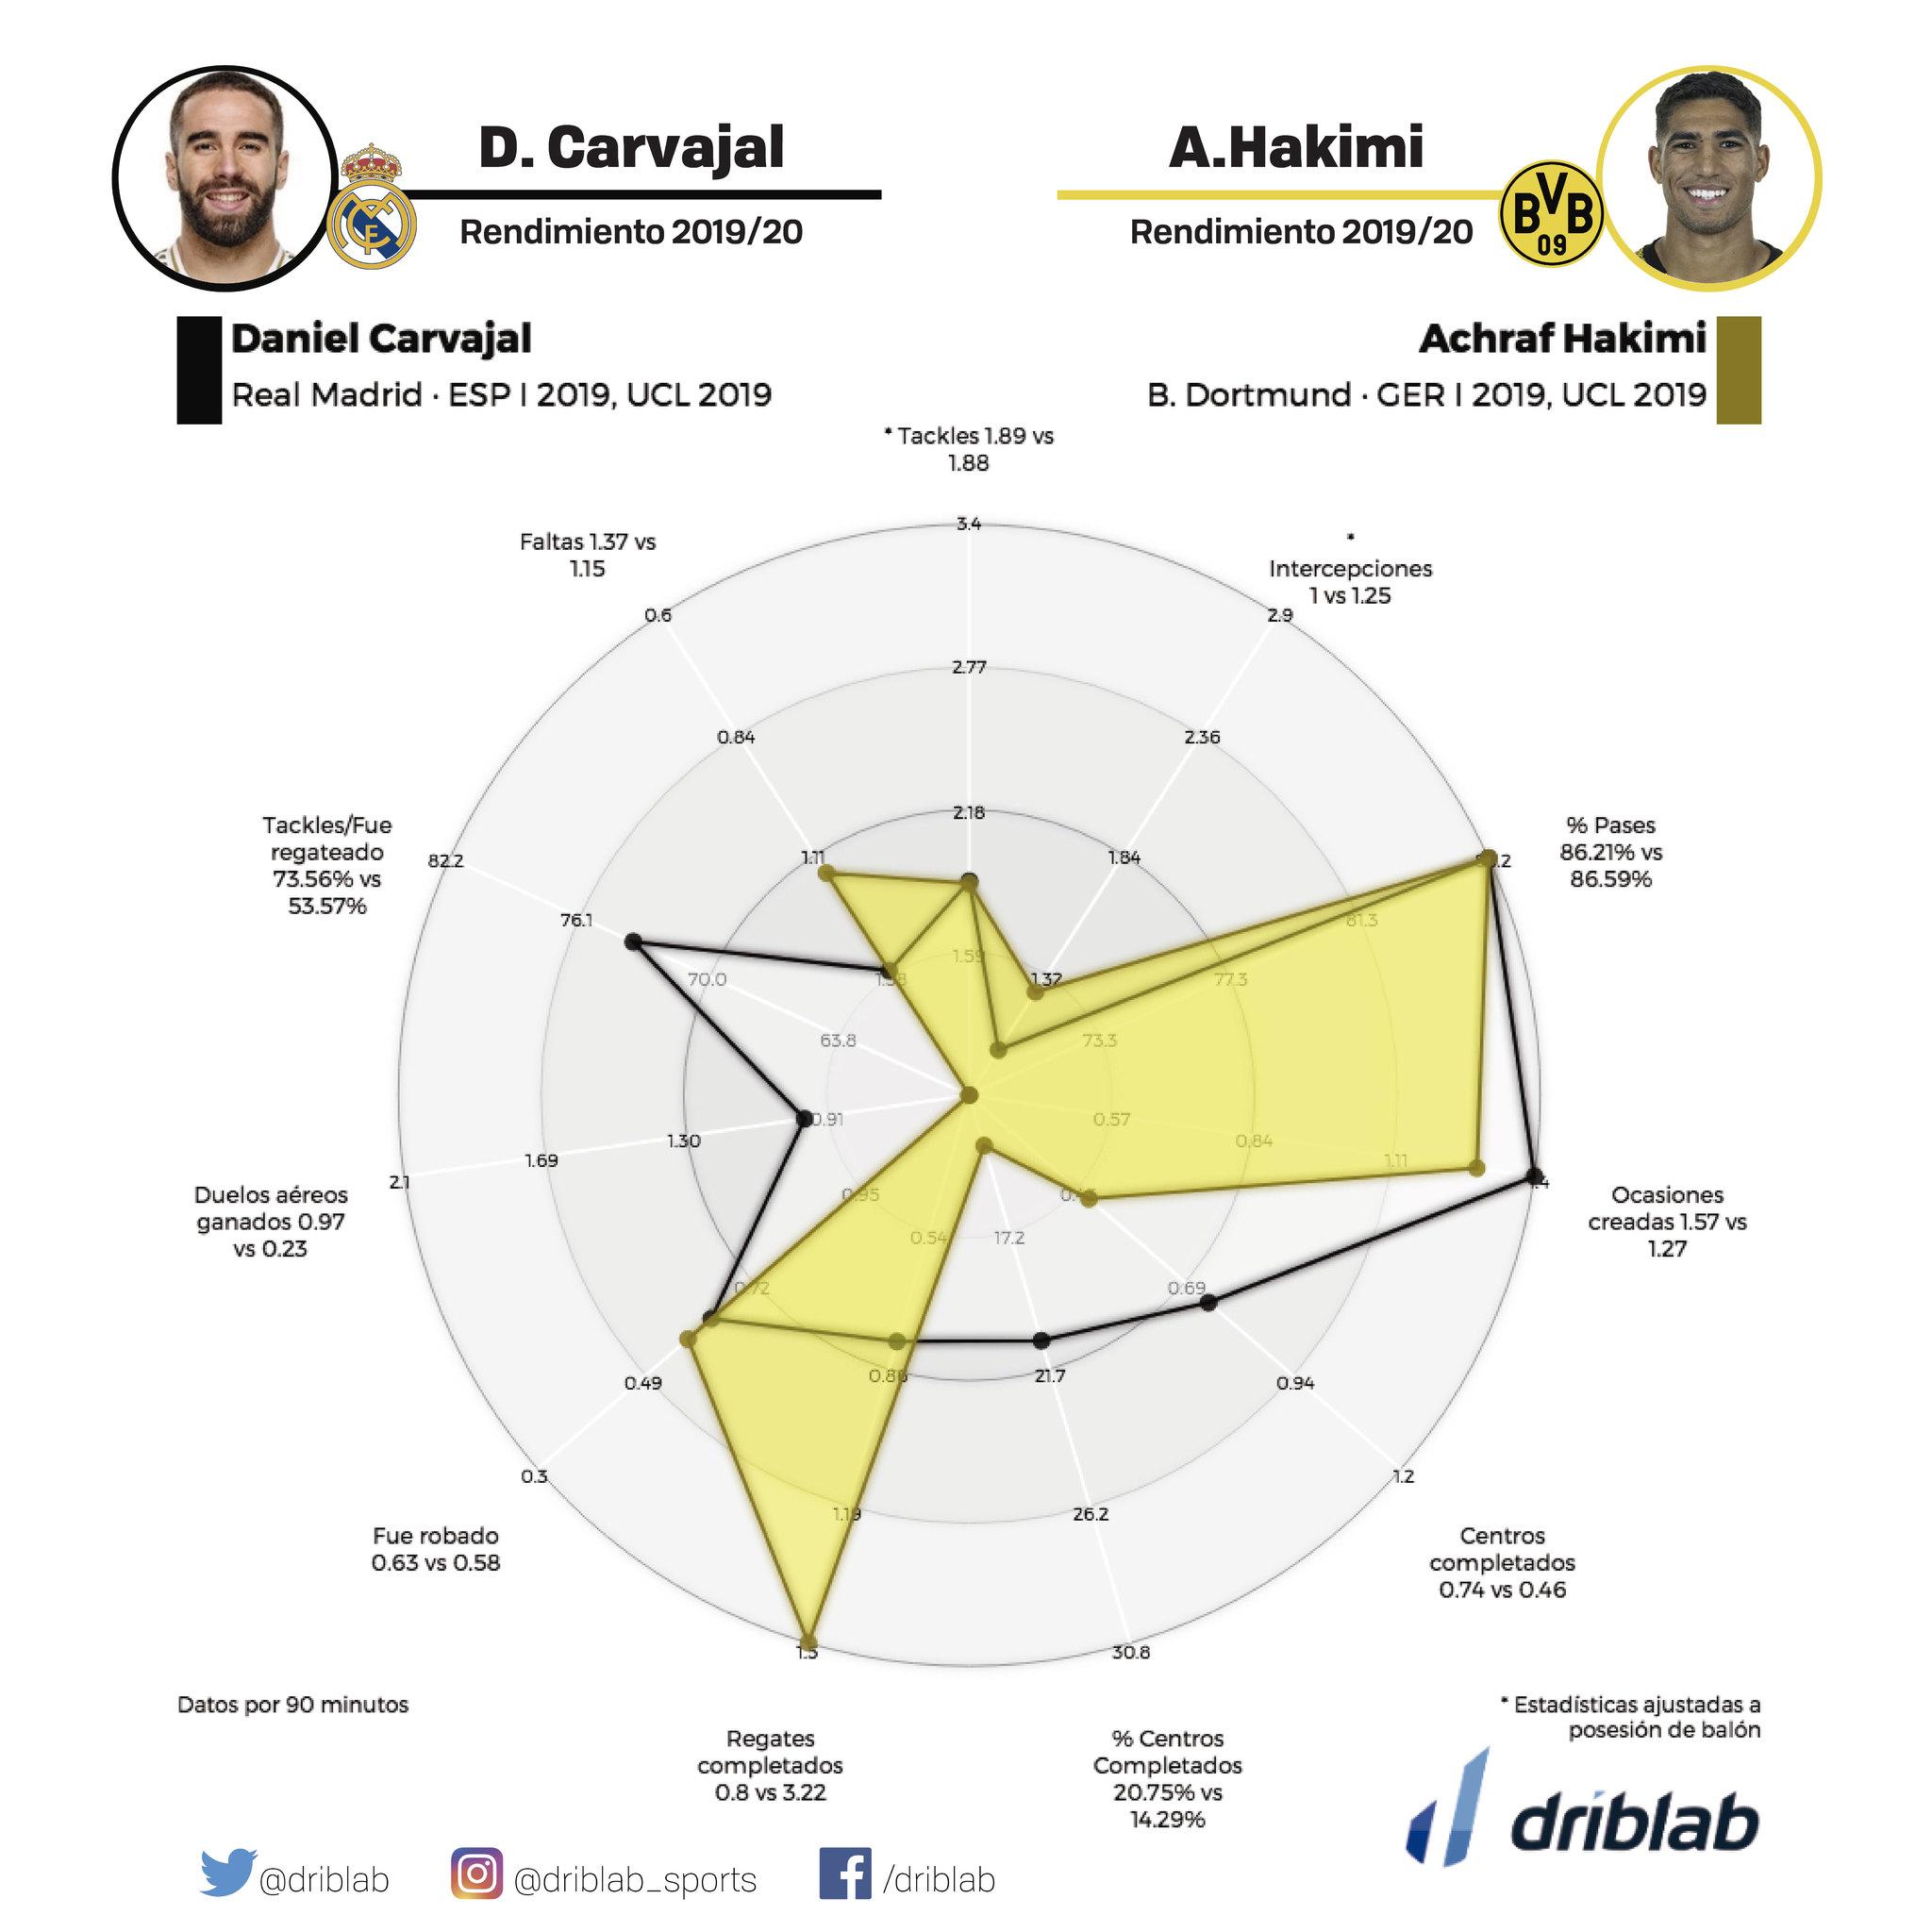 Achraf Hakimi dans le viseur — Juventus